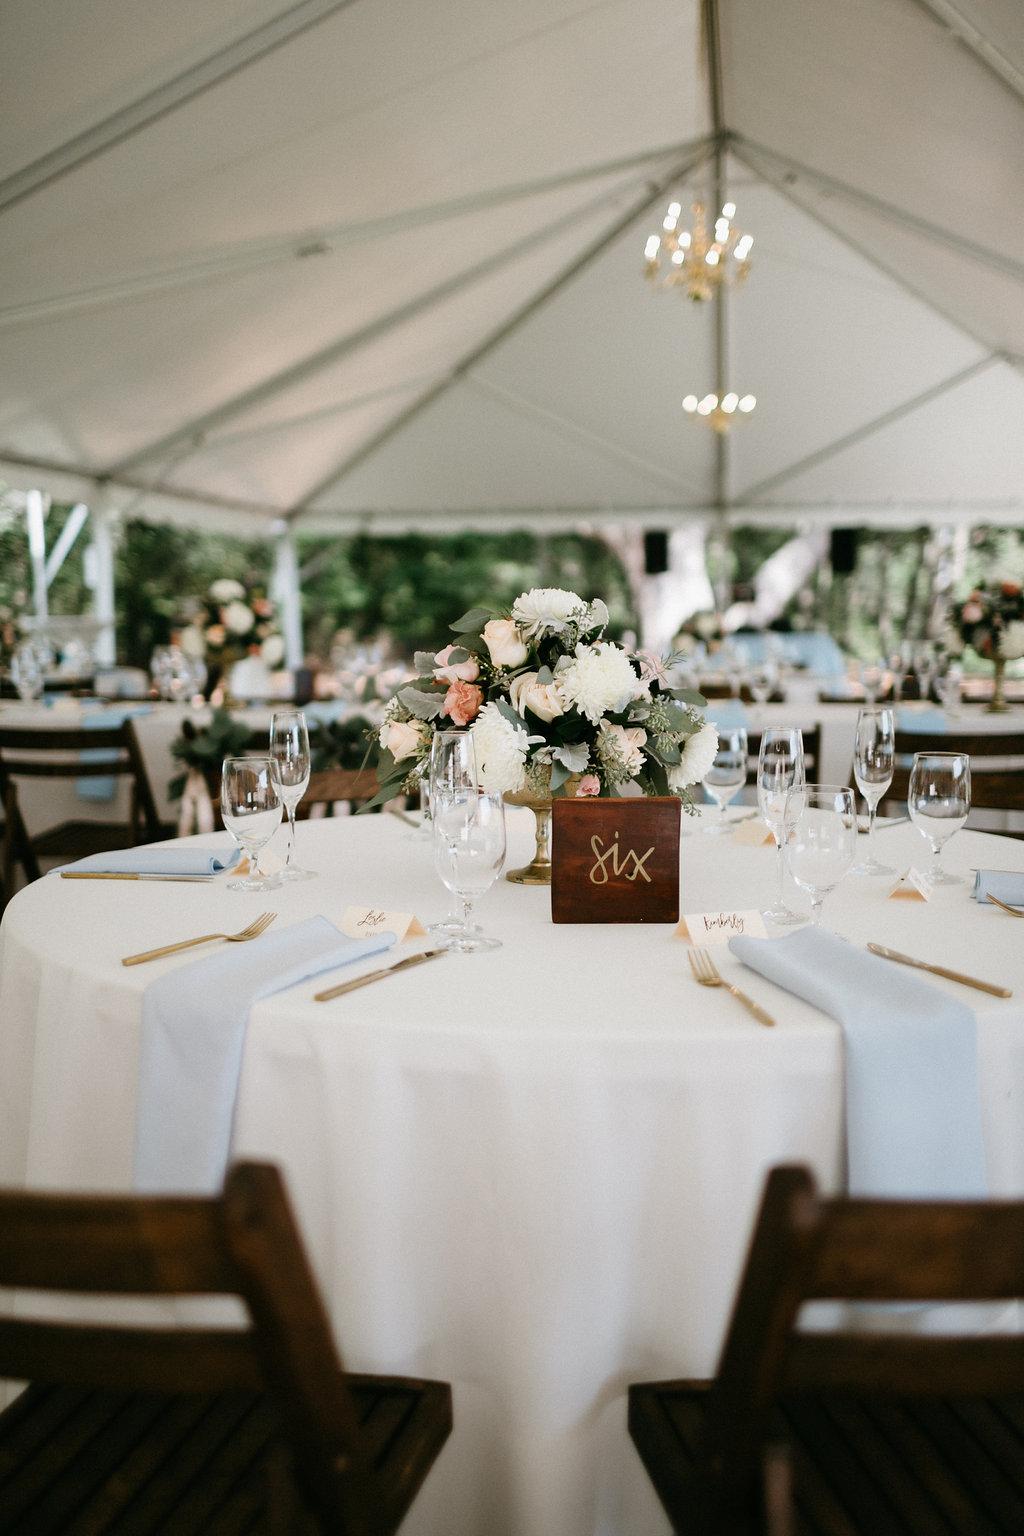 Charleston wedding at Wingate Plantation on Johns Island, SC l Katherine & Rob l Pure Luxe Bride